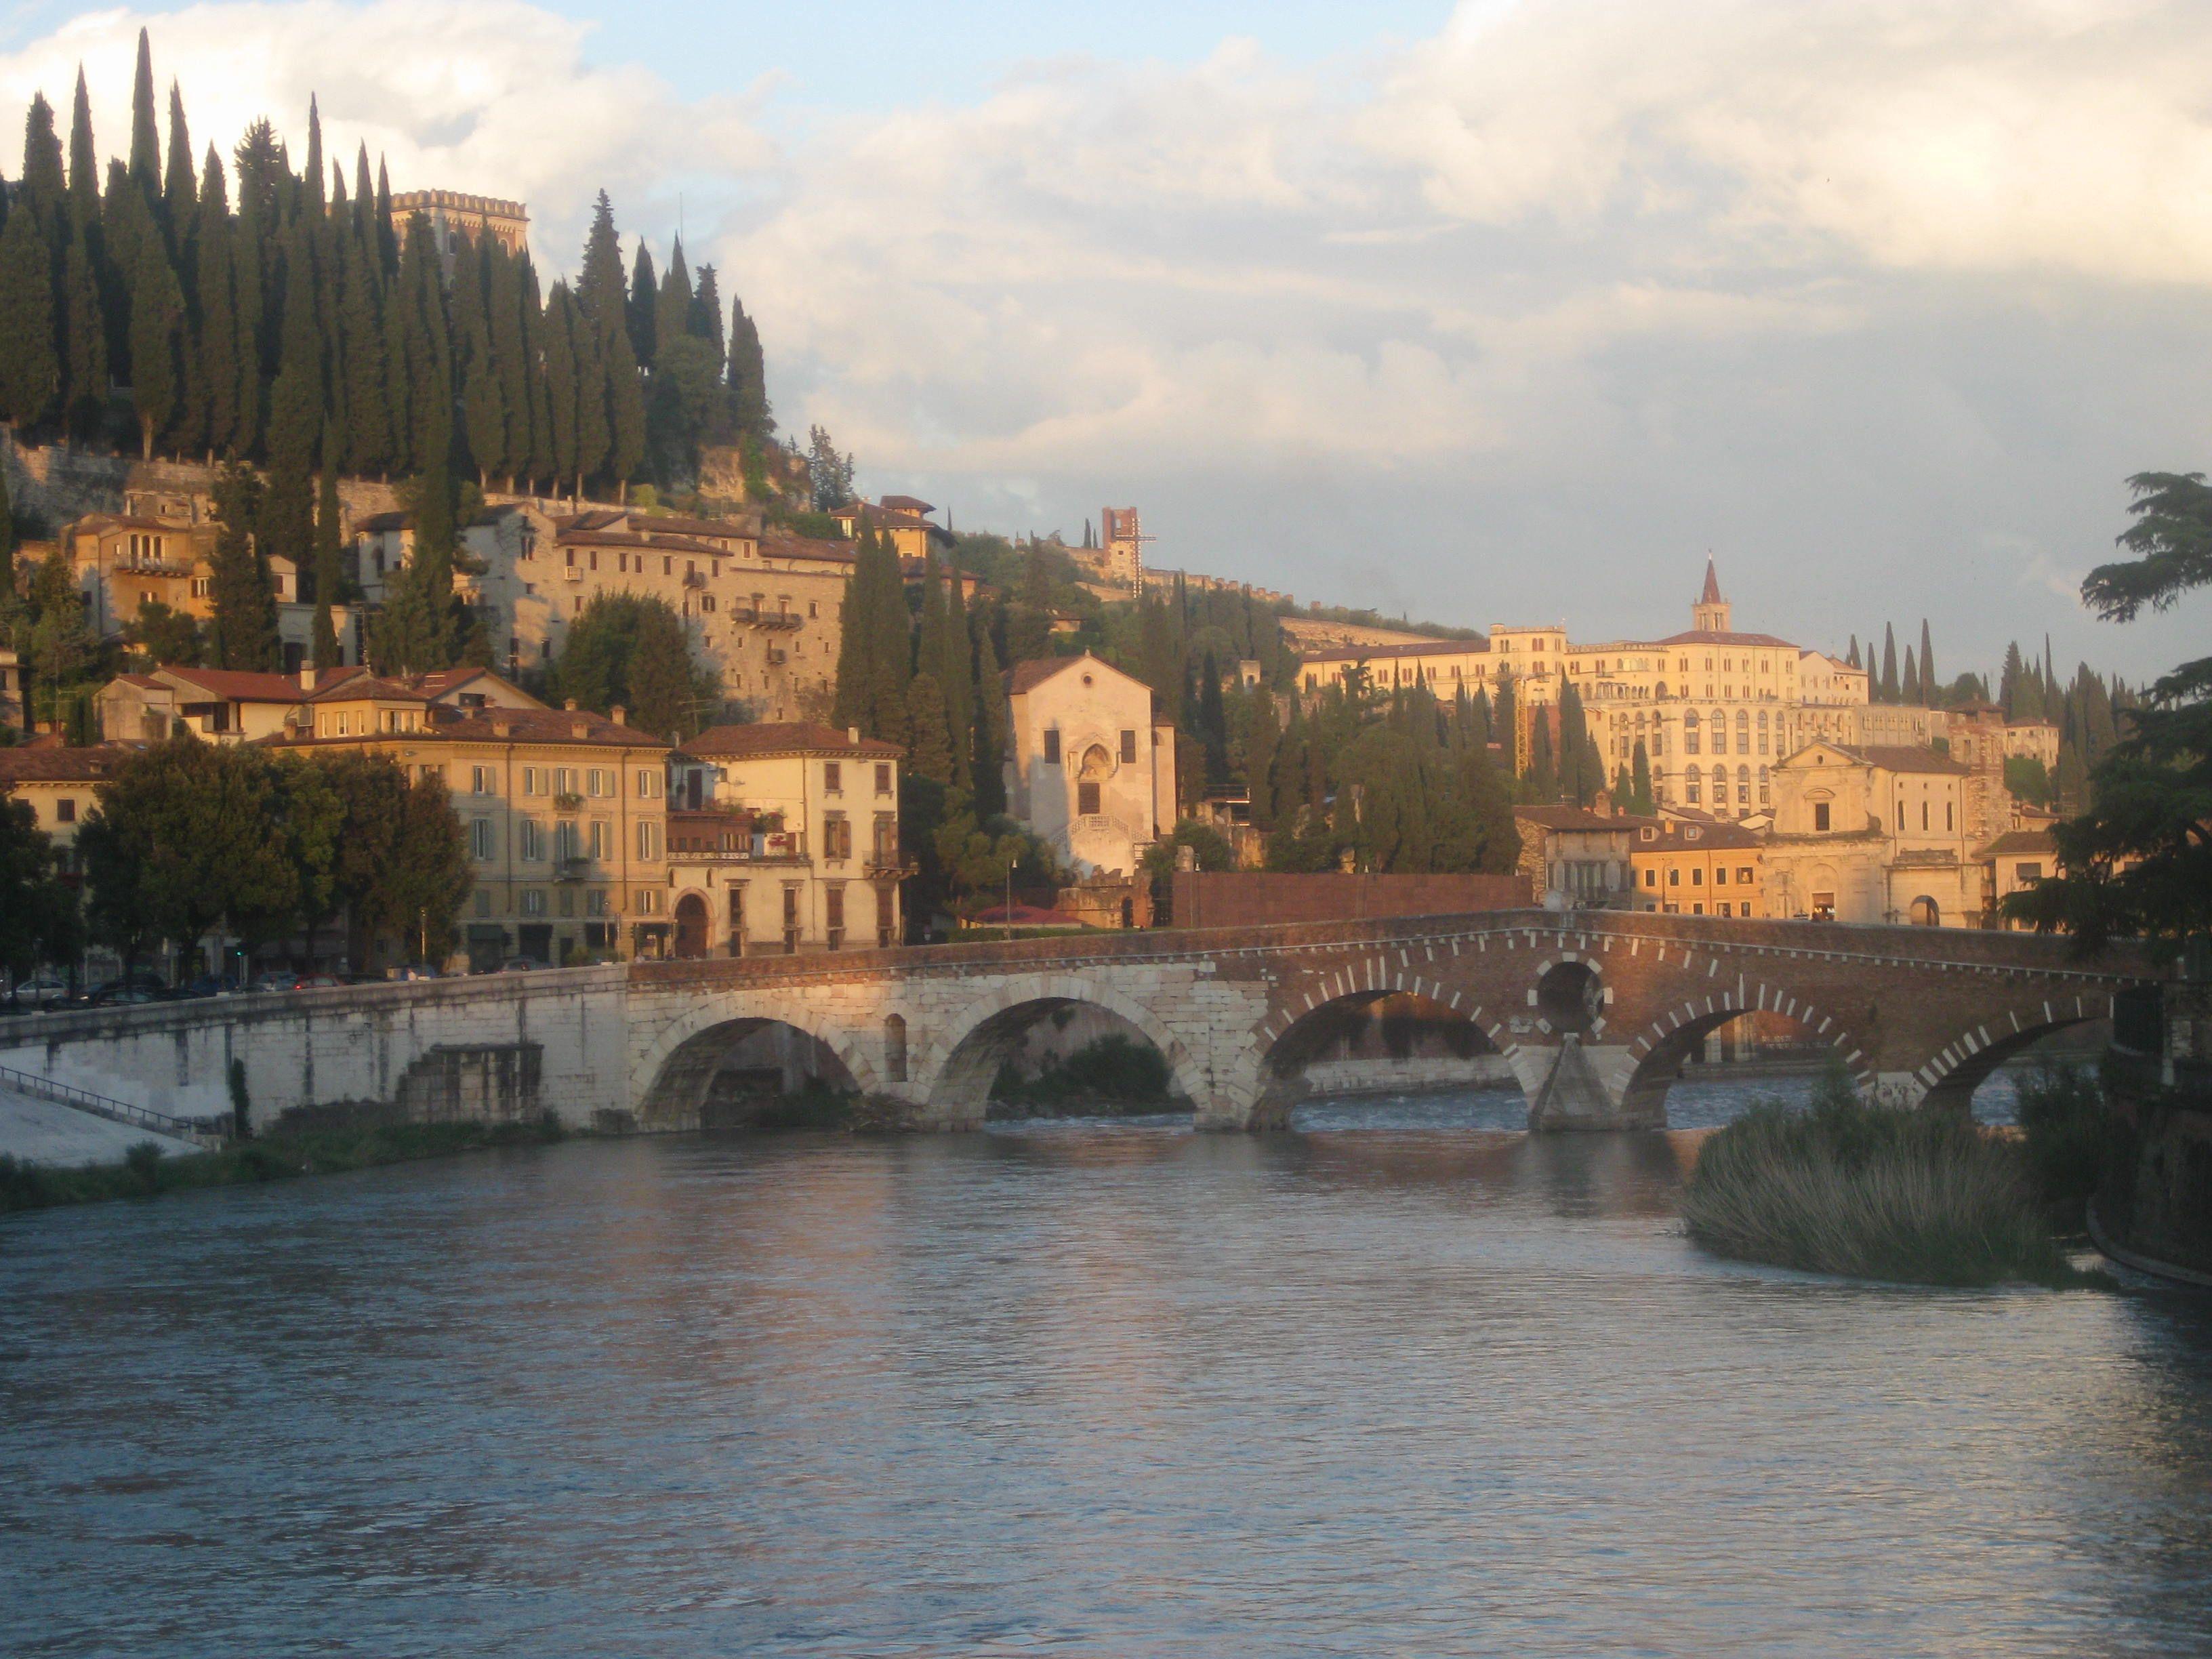 Summer in Verona where I spent a year on Erasmus. It was ...